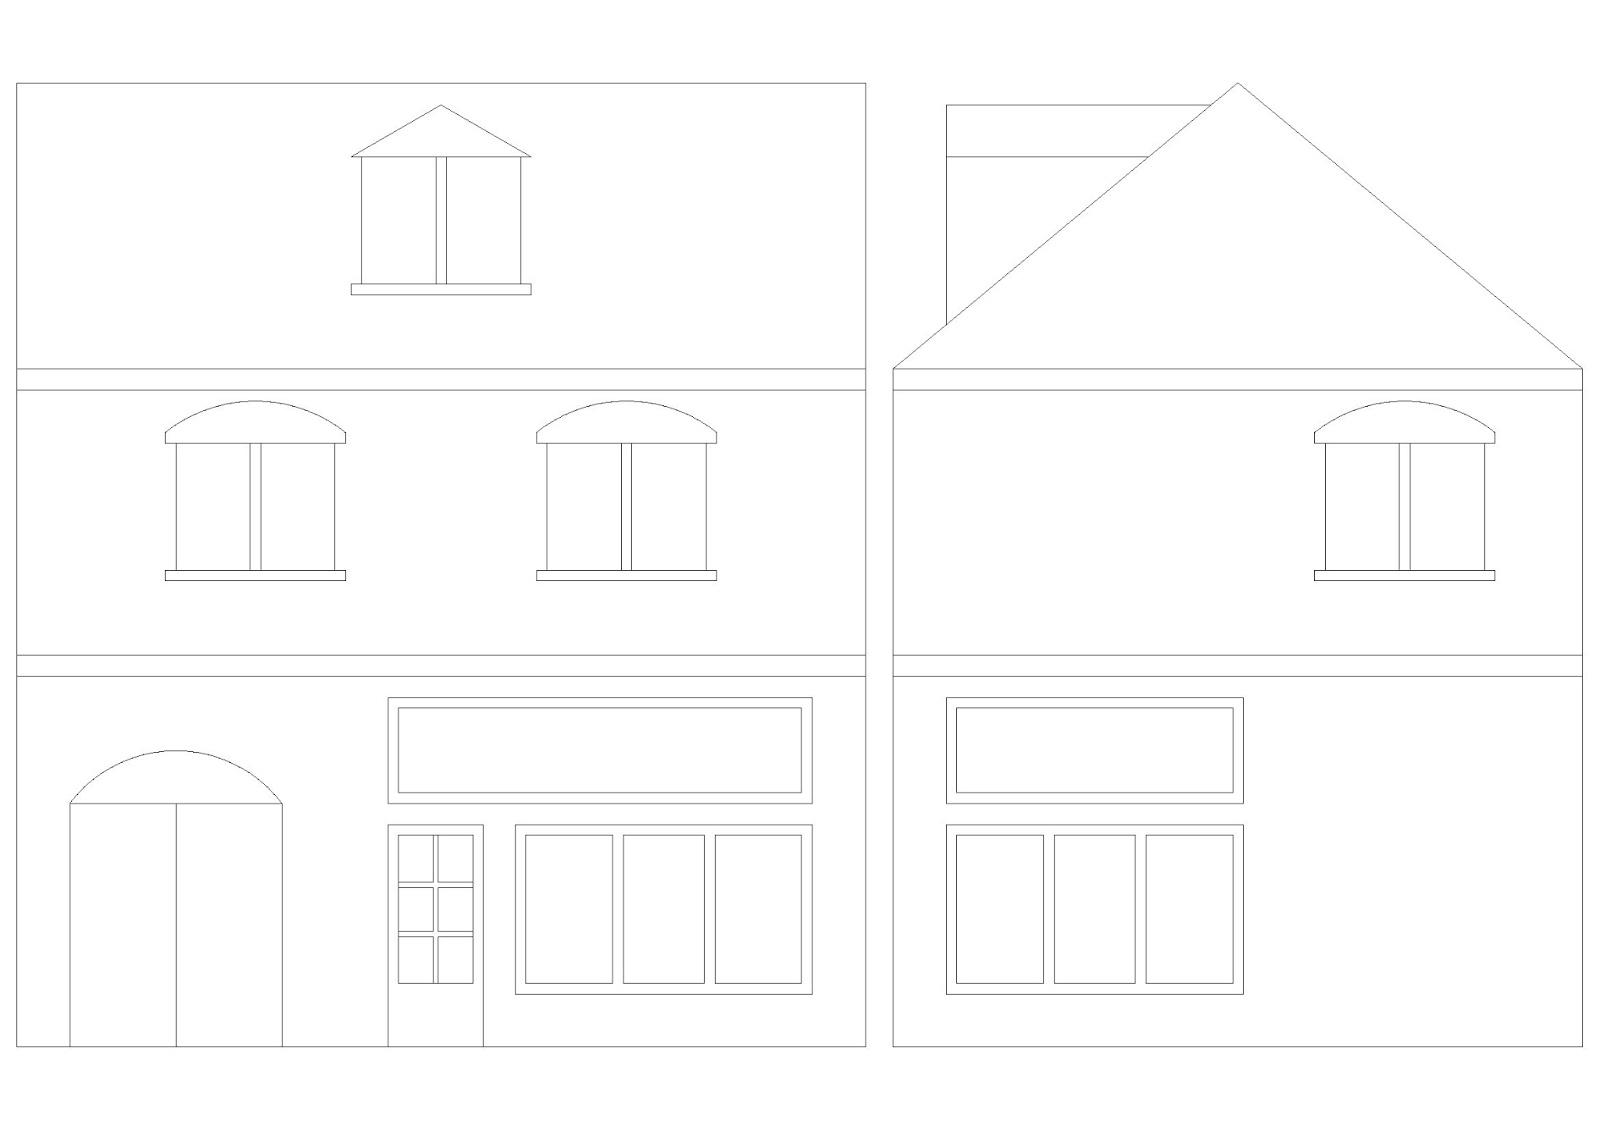 Encobertura escenograf a edificio para miniaturas de 28 mm for Programa para hacer planos a escala